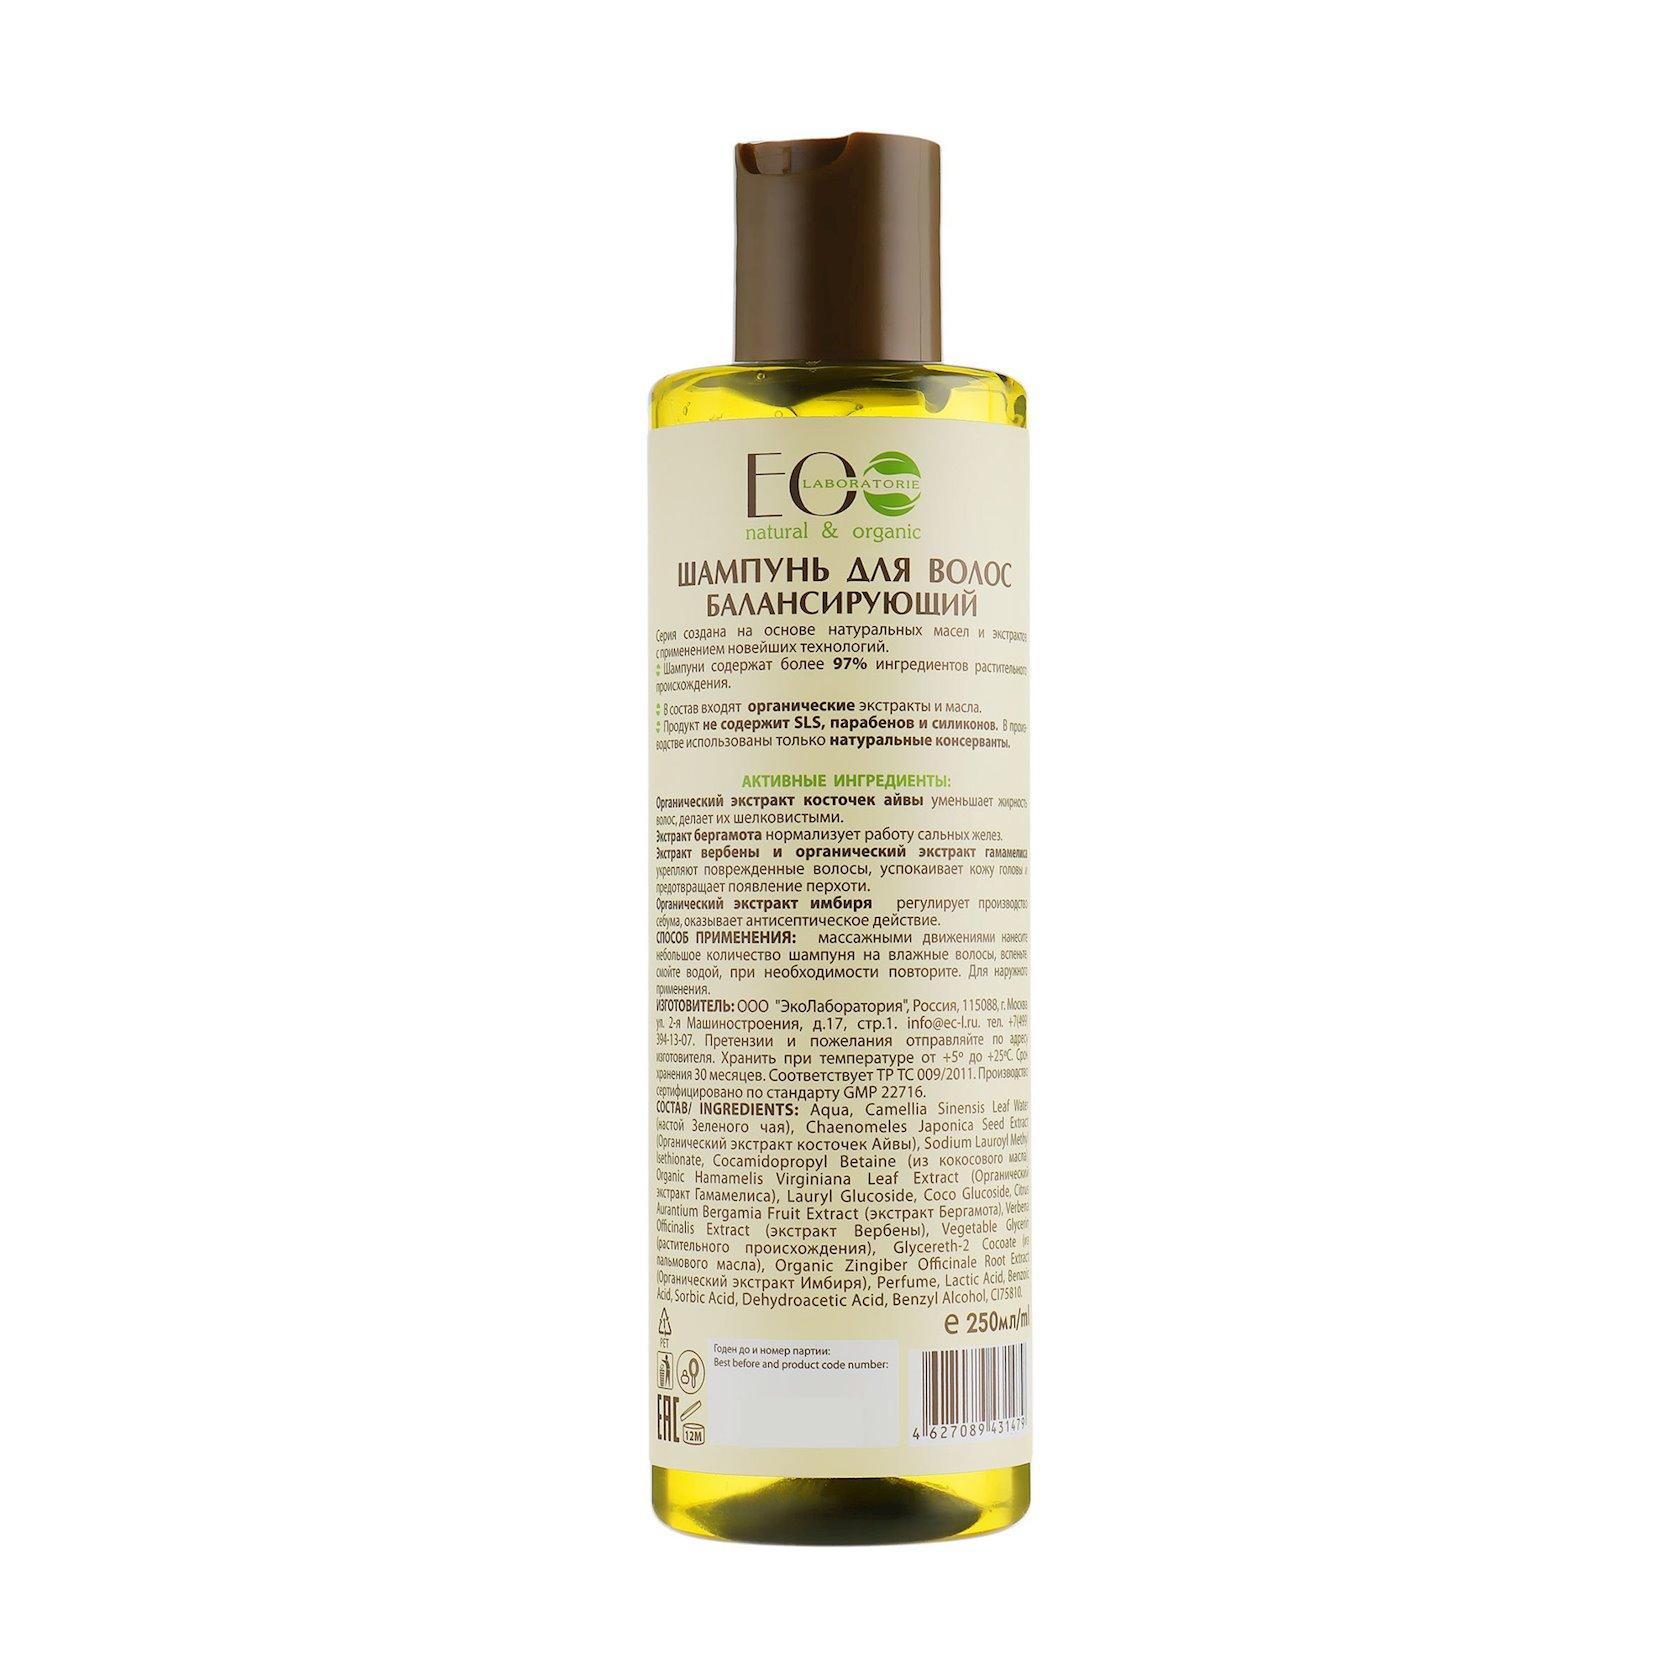 Şampun saç üçün EO Laboratorie Balanslaşdırıcı yağlı saçlar üçün 250 ml